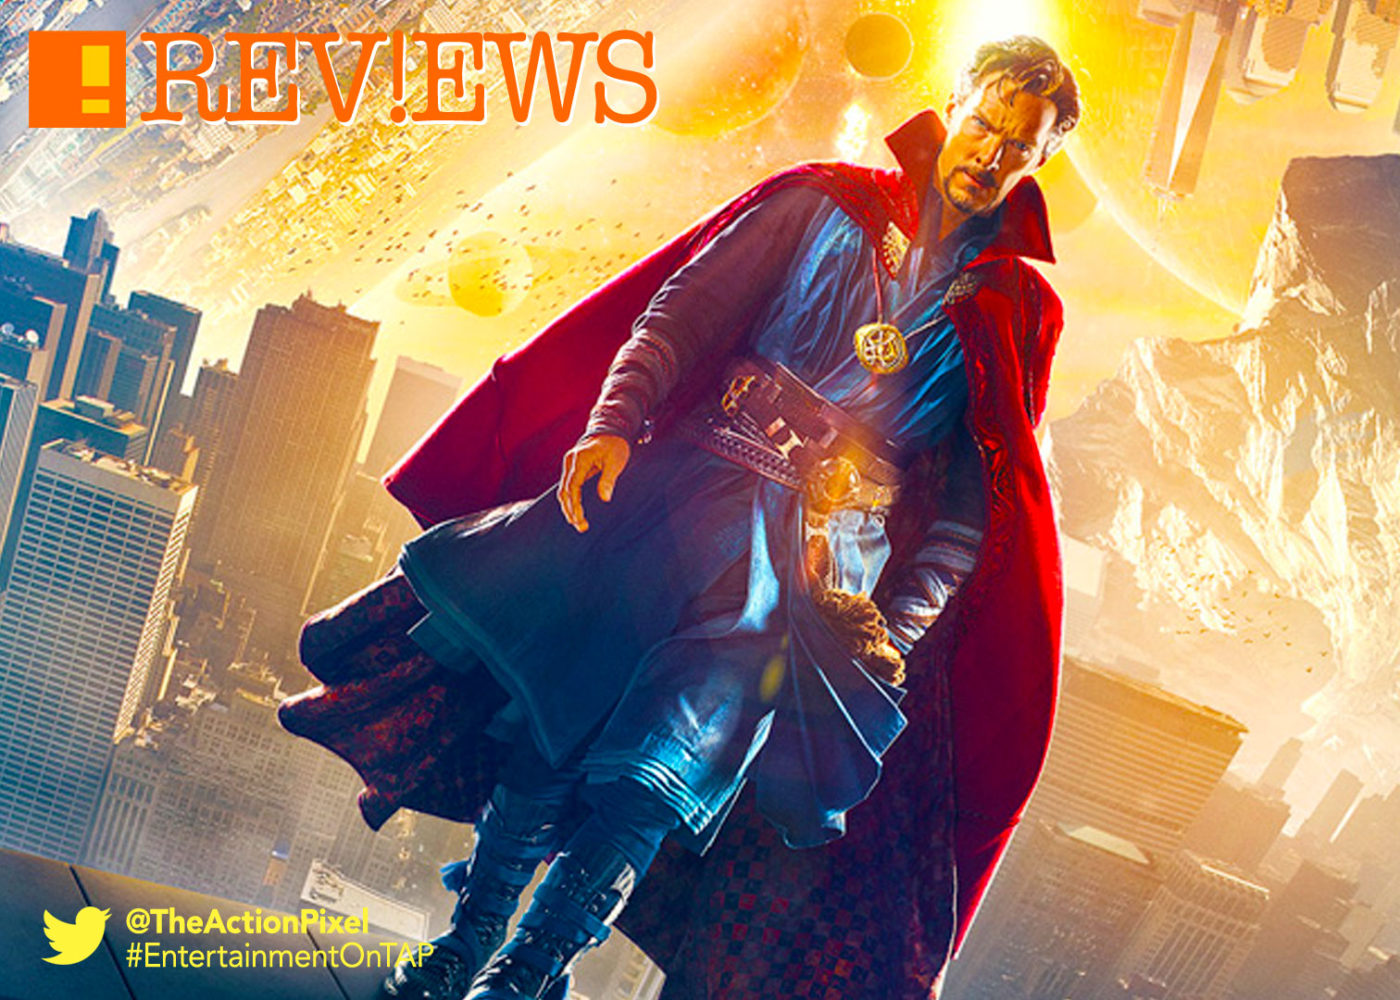 doctor strange,reviews, baron mordo, ancient one, doctor strange, astral, dark universe, stephen strange, marvel, marvel comics, marvel studios, the action pixel, entertainment on tap,